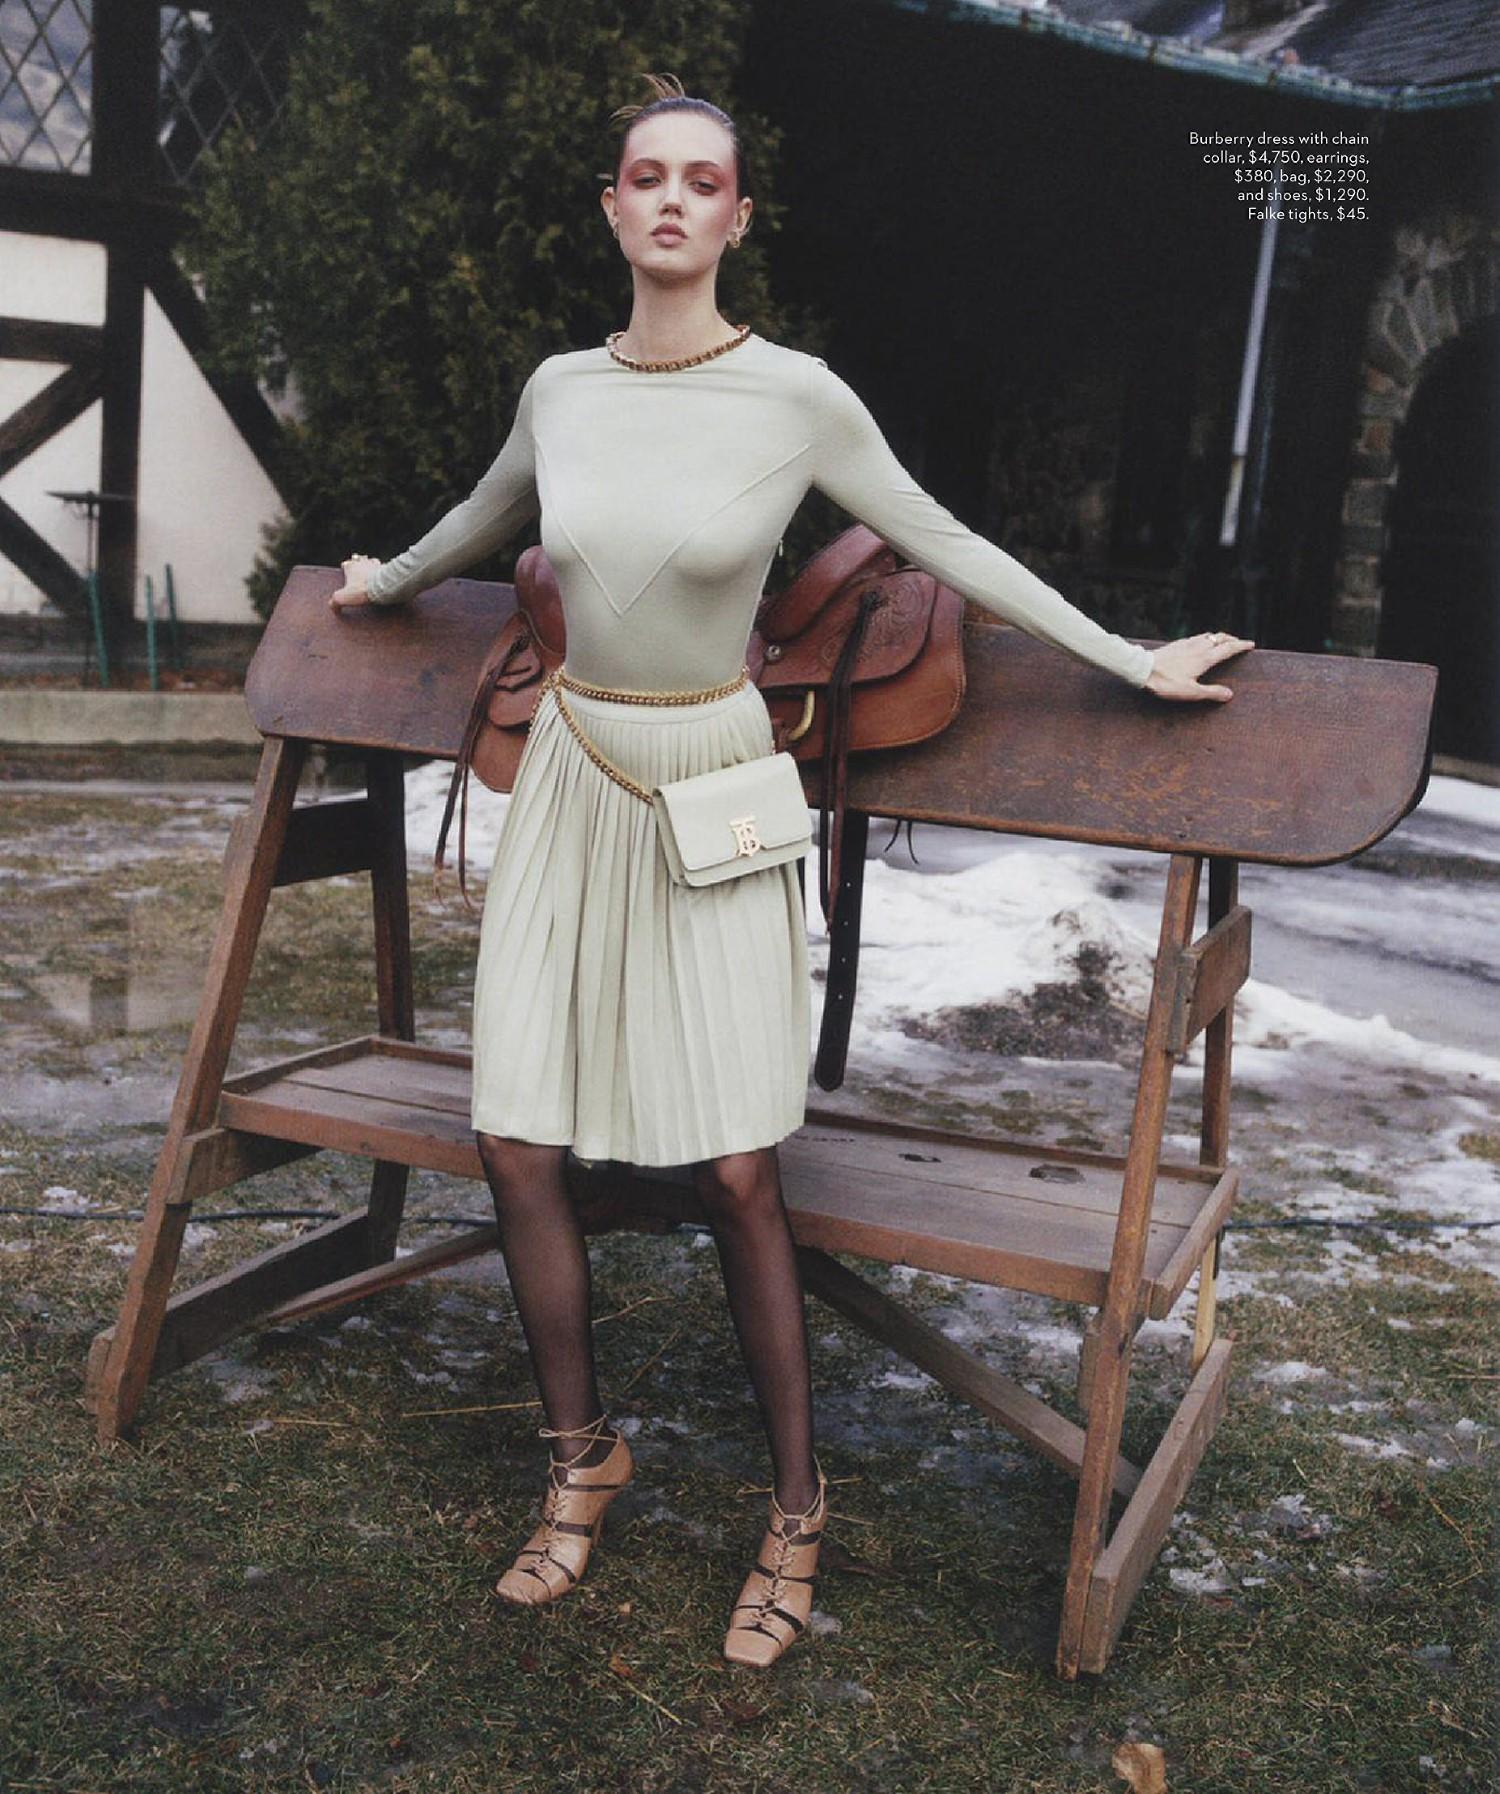 Lindsey-Wixson-Vogue-Australia-April-2019- (1).jpg